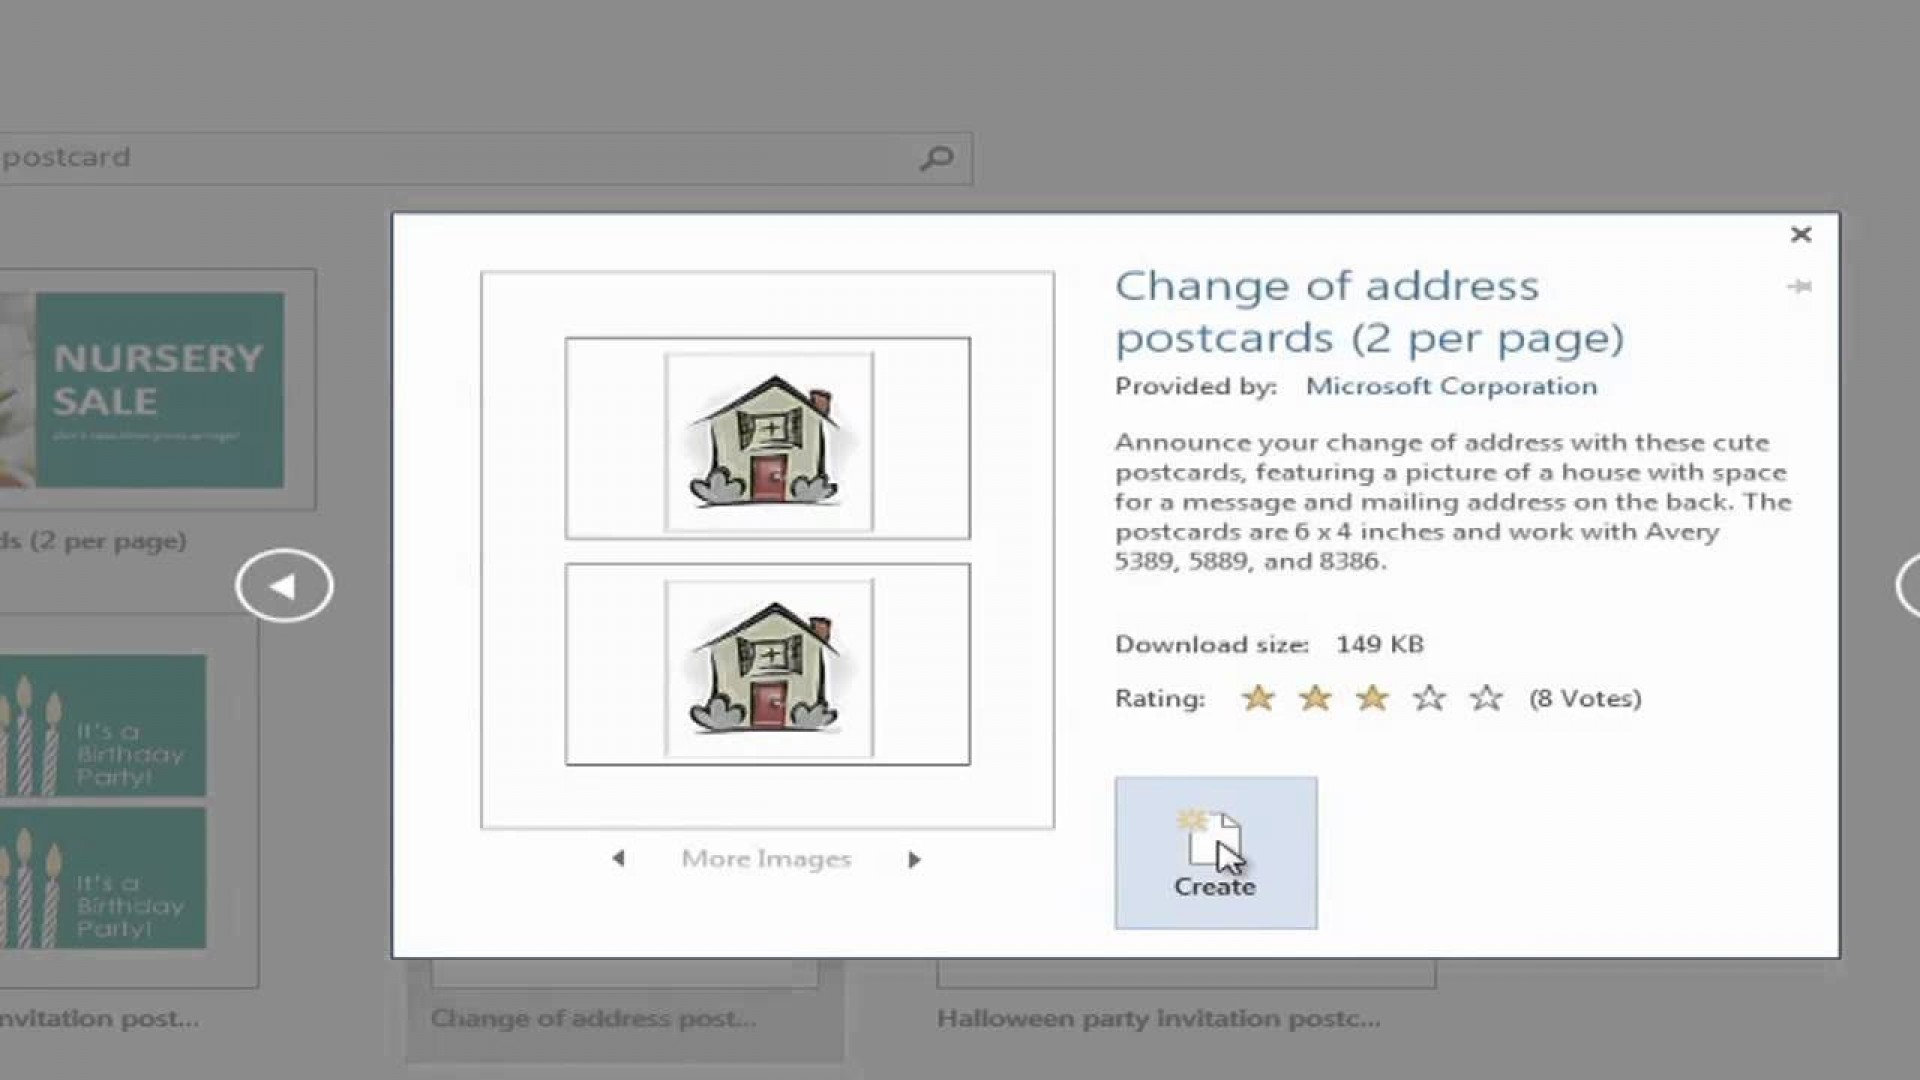 003 Wondrou Microsoft Word Invitation Template 2 Per Page Example 1920